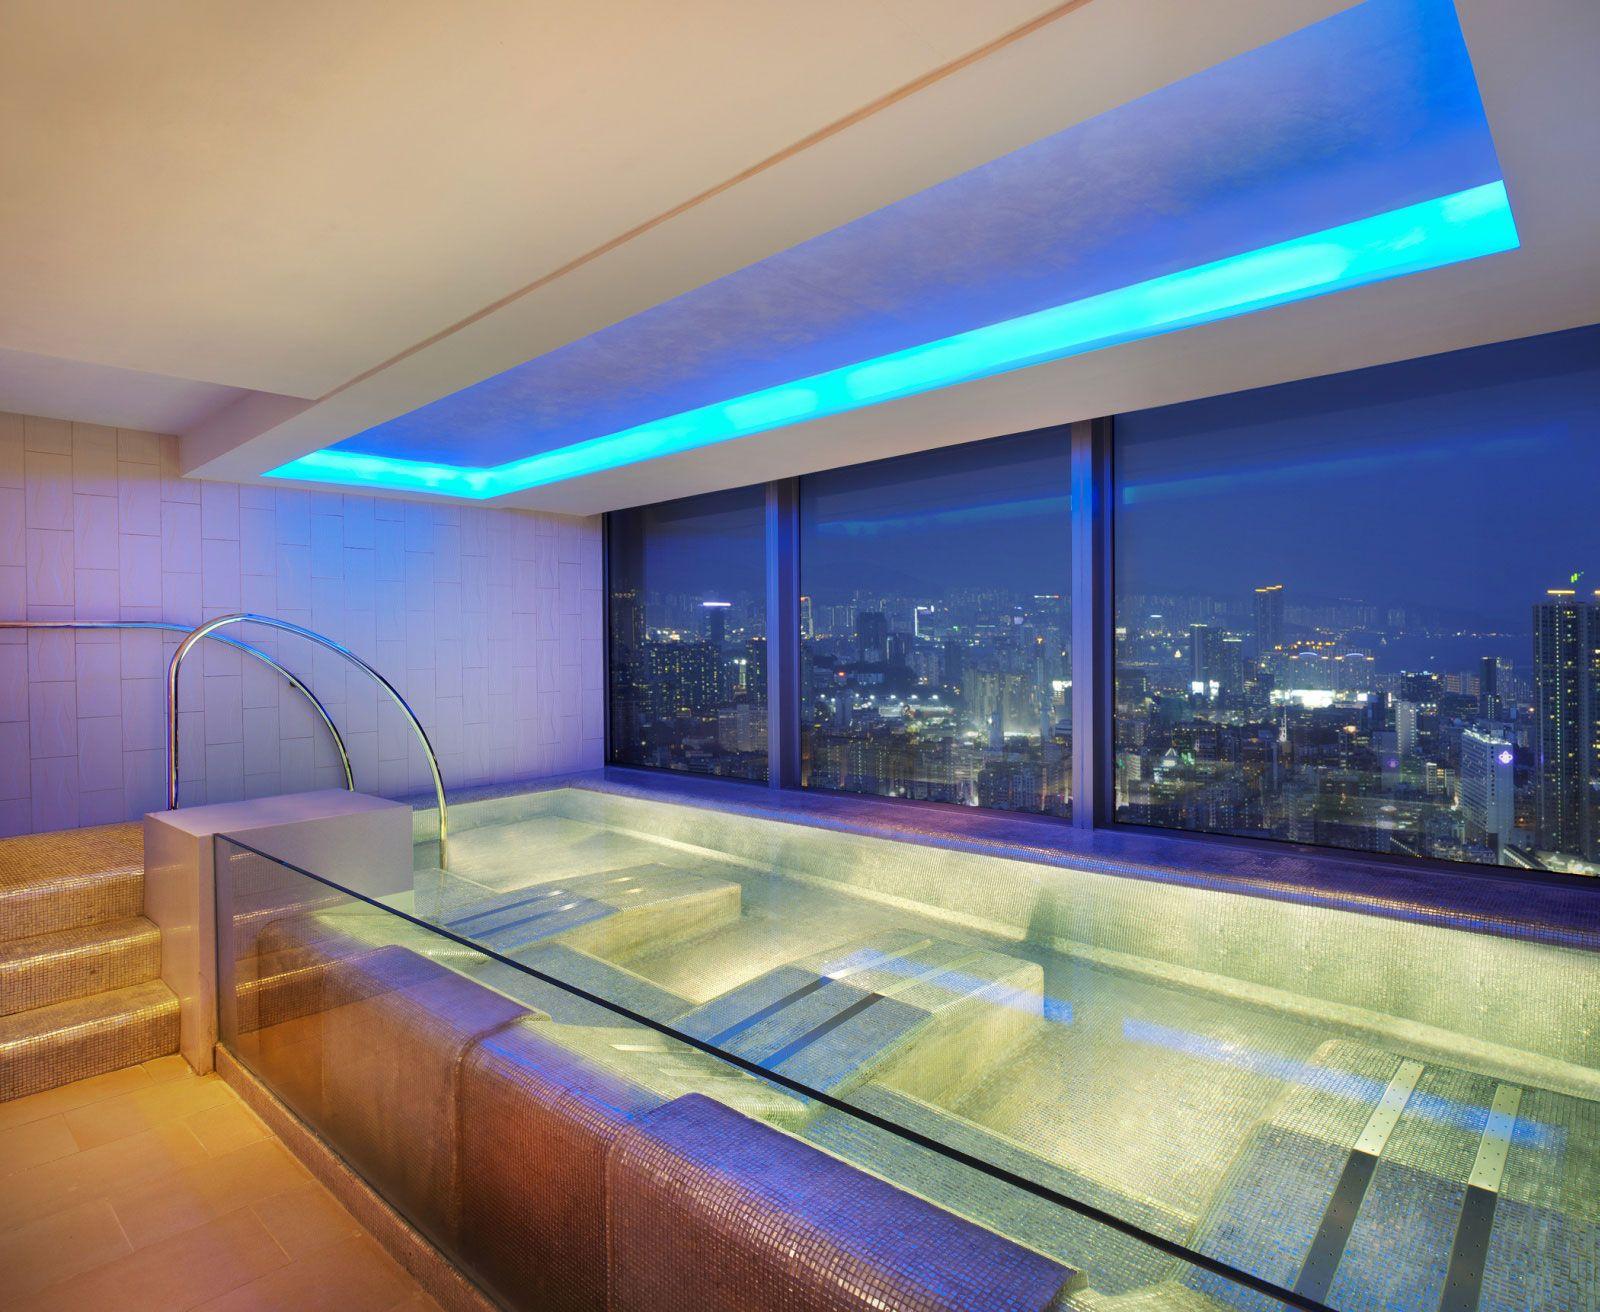 Luxurious W Hong Kong Hotel Caandesign Architecture